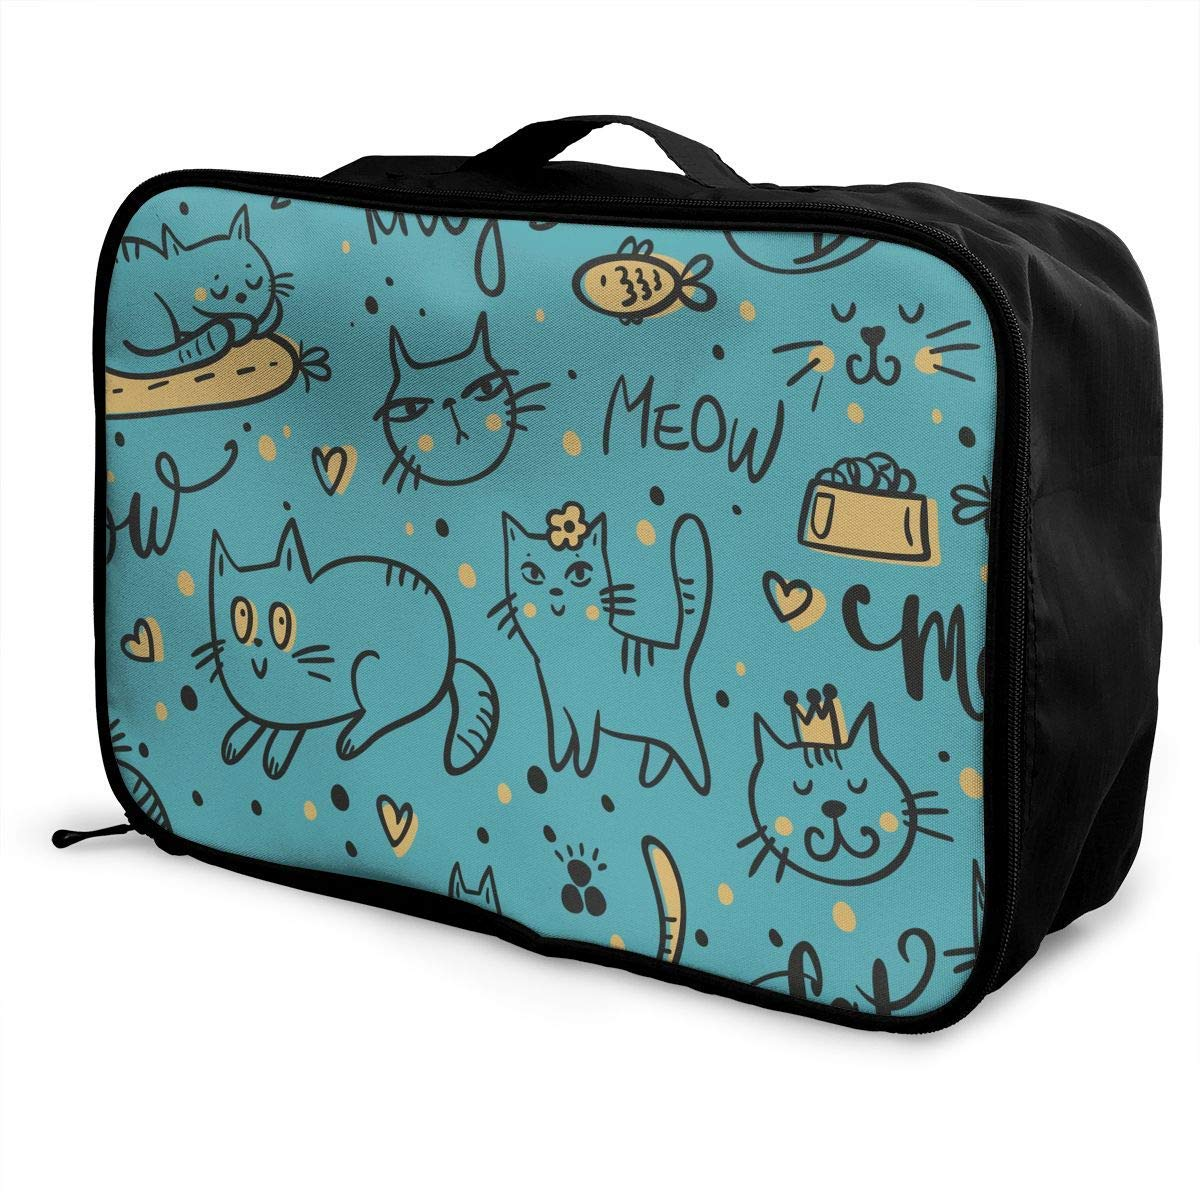 Travel Duffel Bag Waterproof Fashion Lightweight Large Capacity Portable Duffel Bag for Men /& Women Cute Leisurely Cats Kitten JTRVW Luggage Bags for Travel